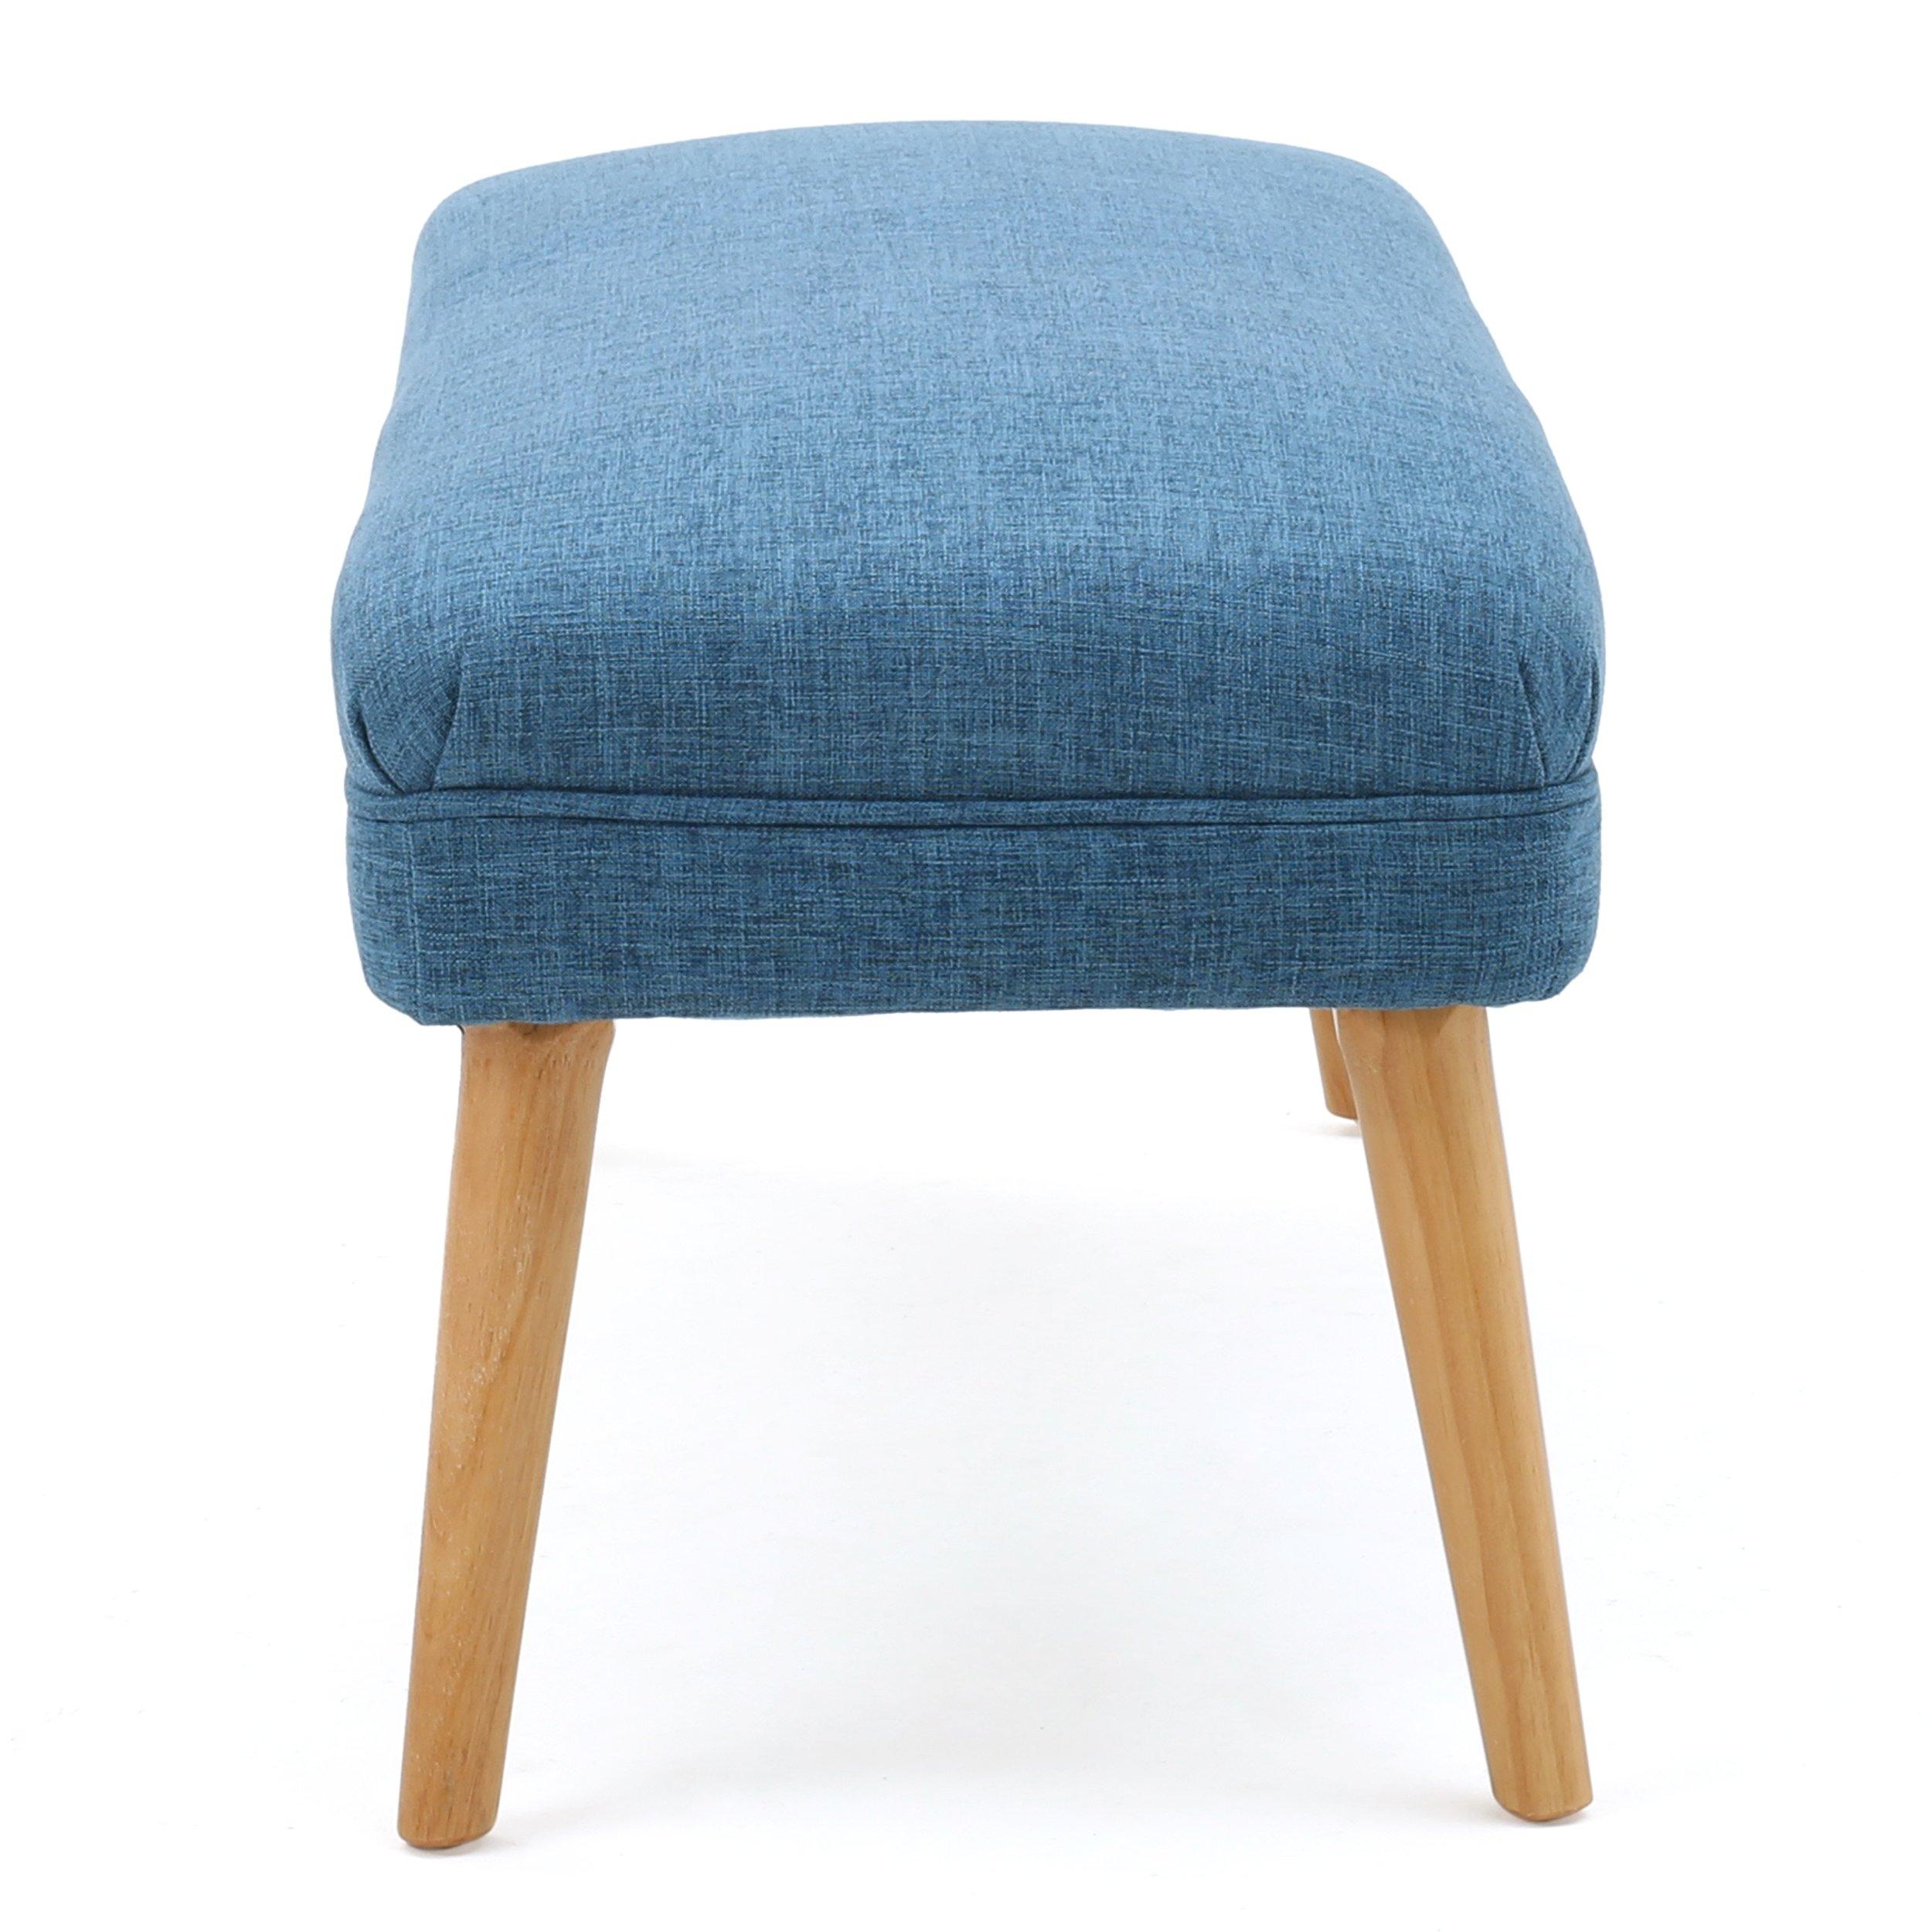 Dumont Mid Century Modern Fabric Ottoman (Blue) by GDF Studio (Image #3)